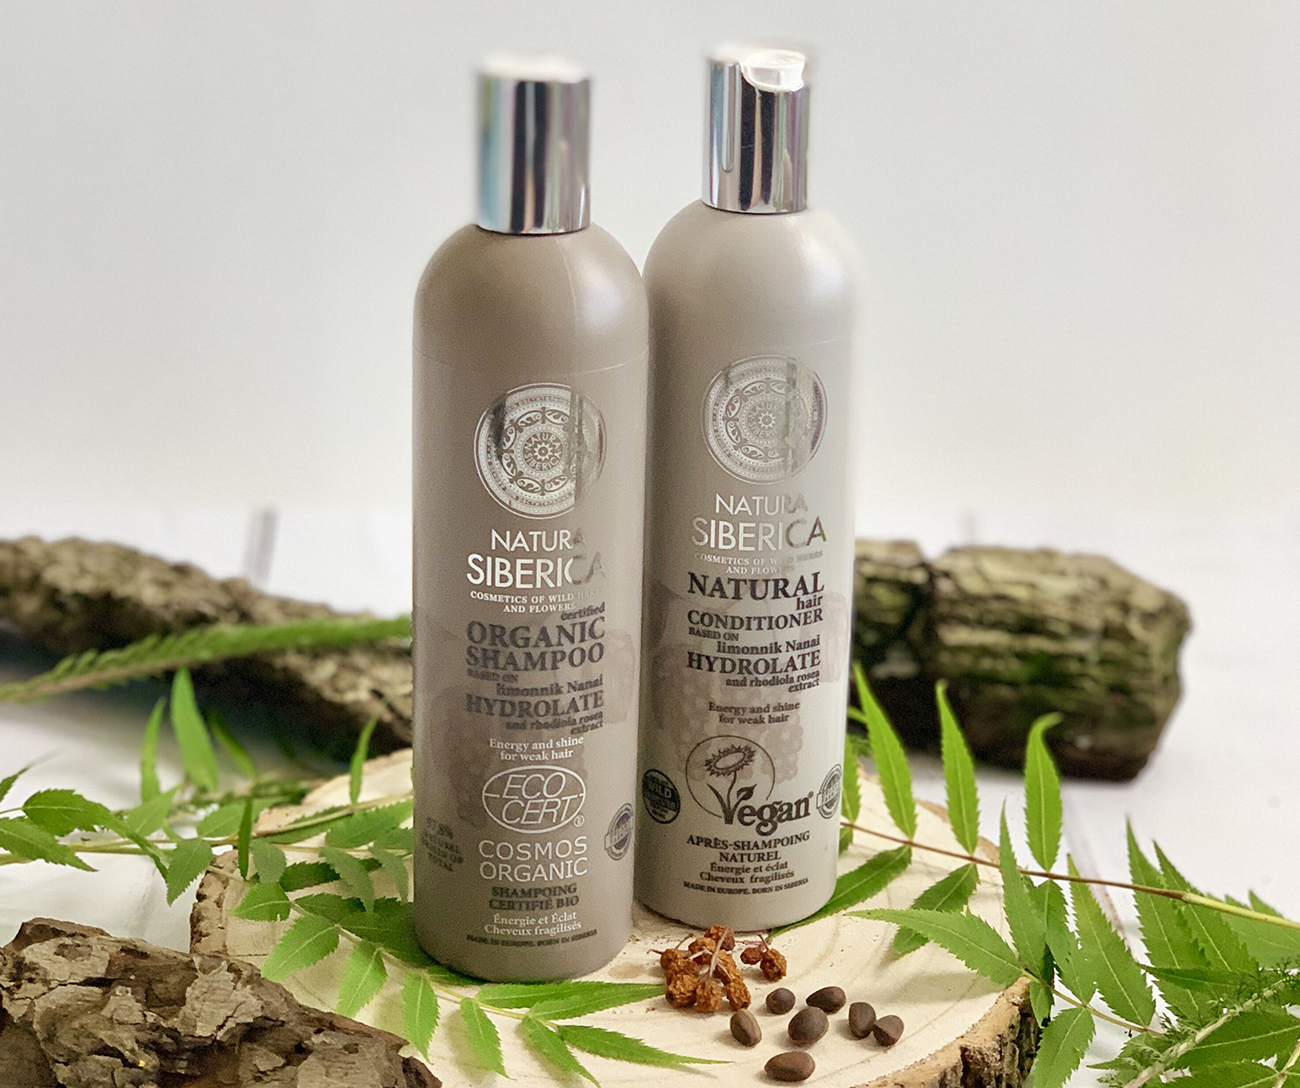 Surefire media launch new uk ecommerce website for leading natural cosmetics brand natura siberica